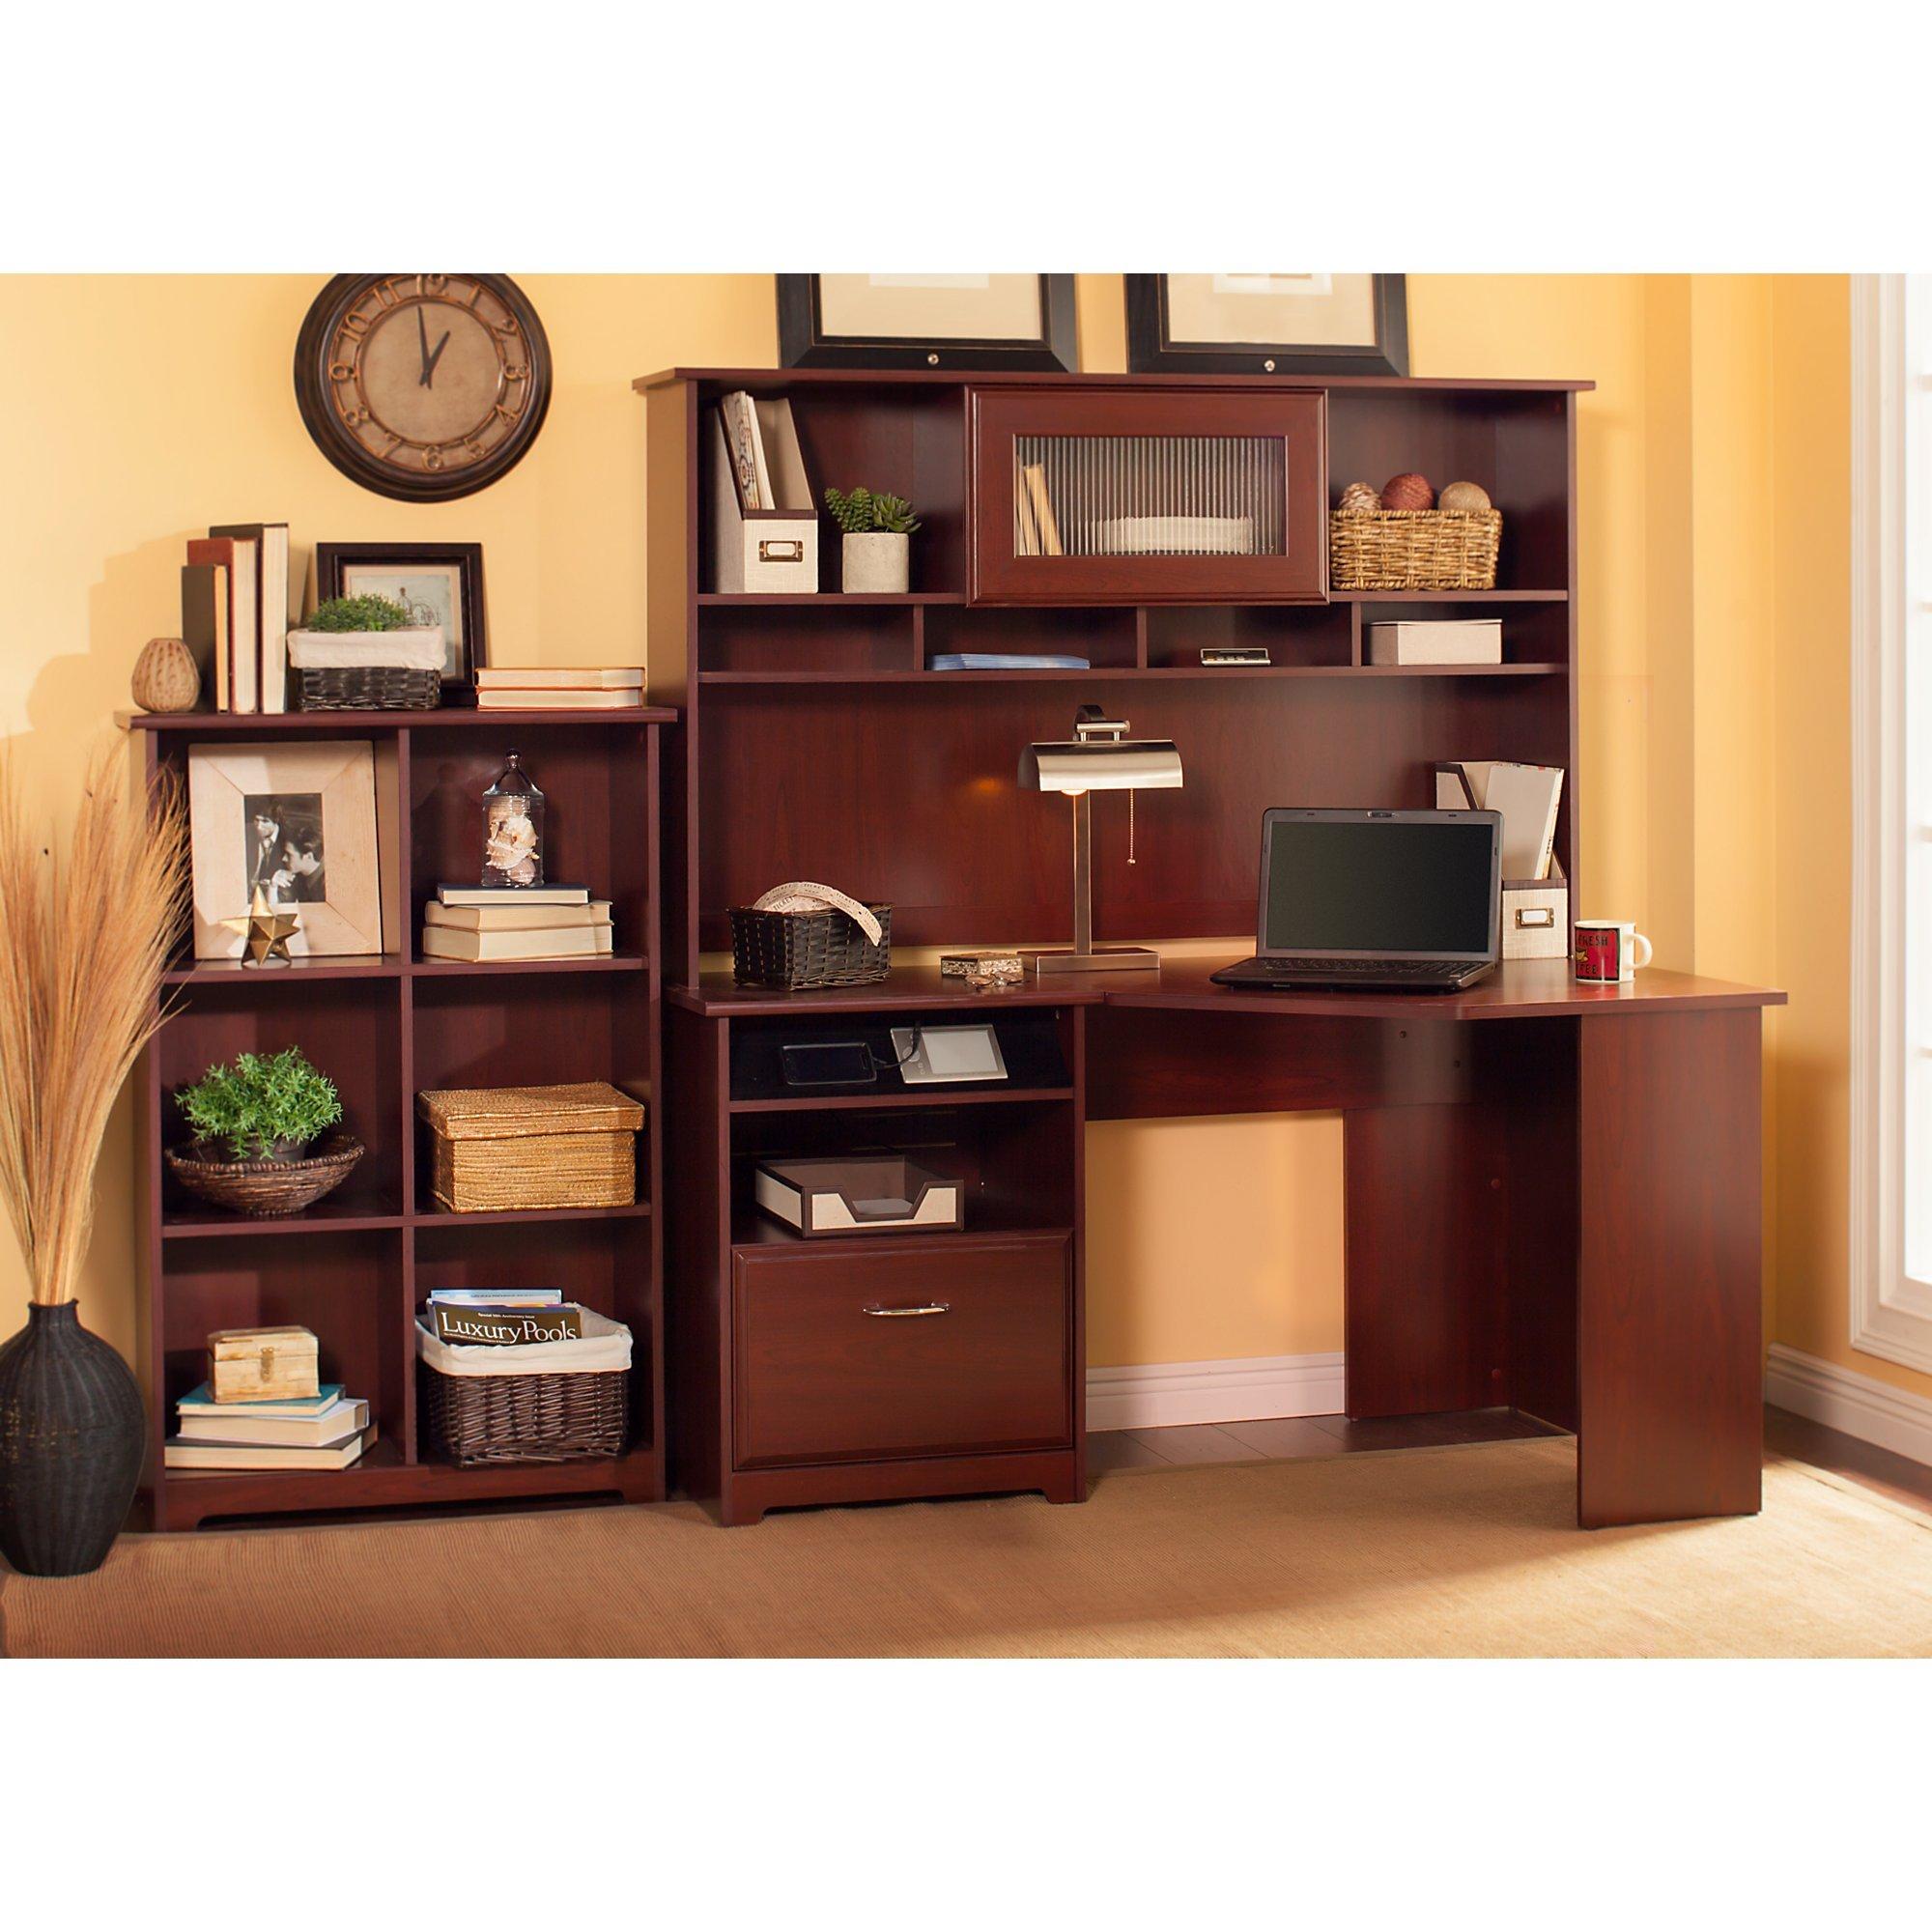 Cheap Corner Hutch Desk Find Corner Hutch Desk Deals On